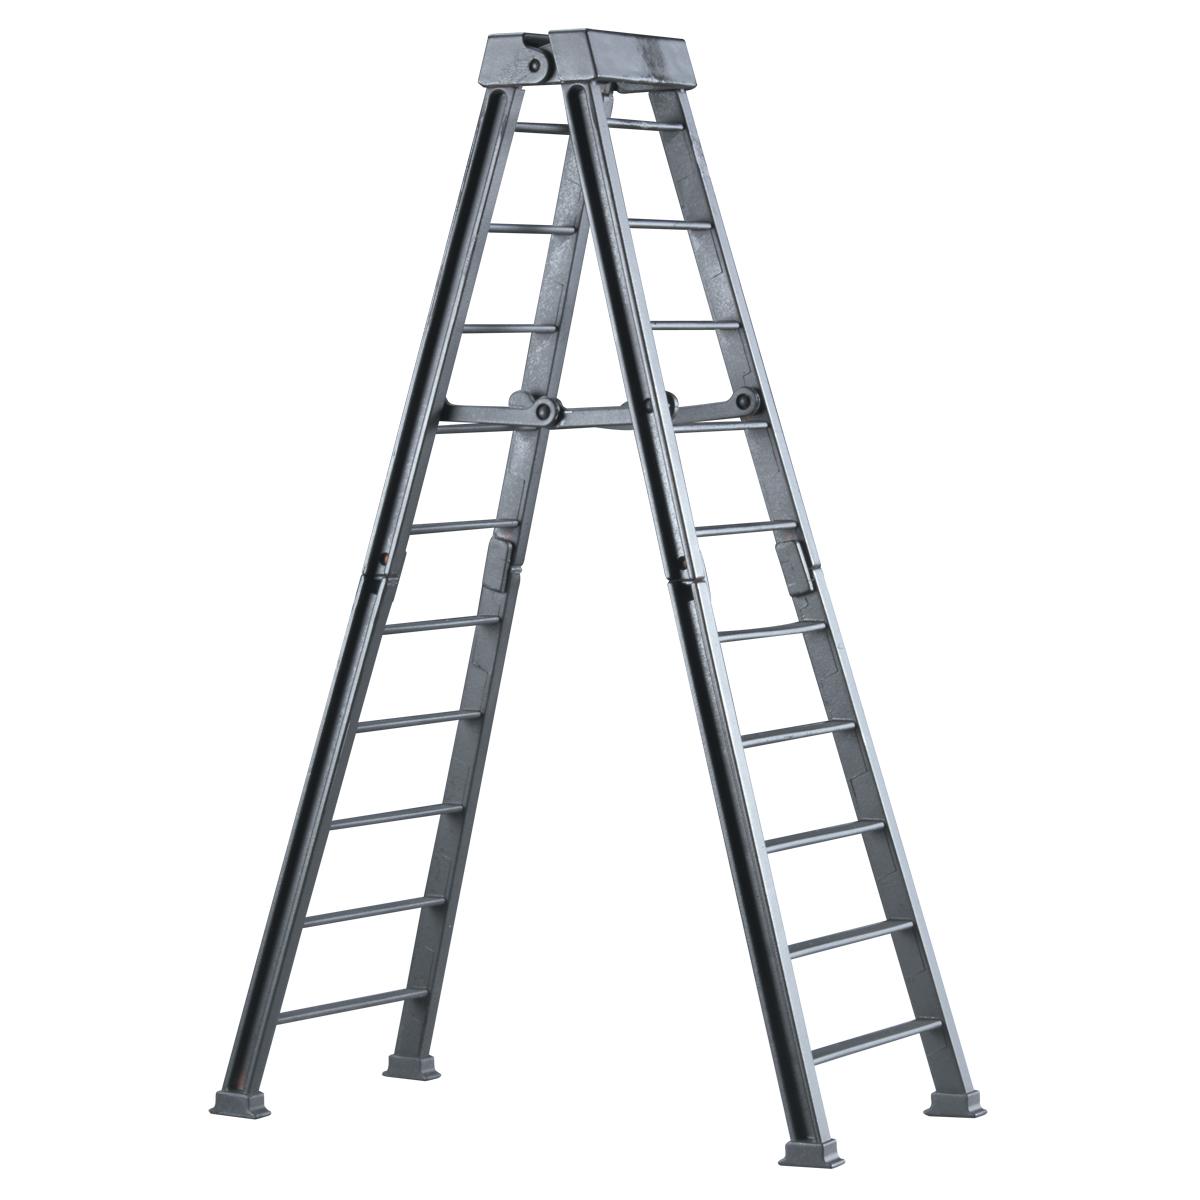 Ladder Match For Miz At Wrestlemania 28